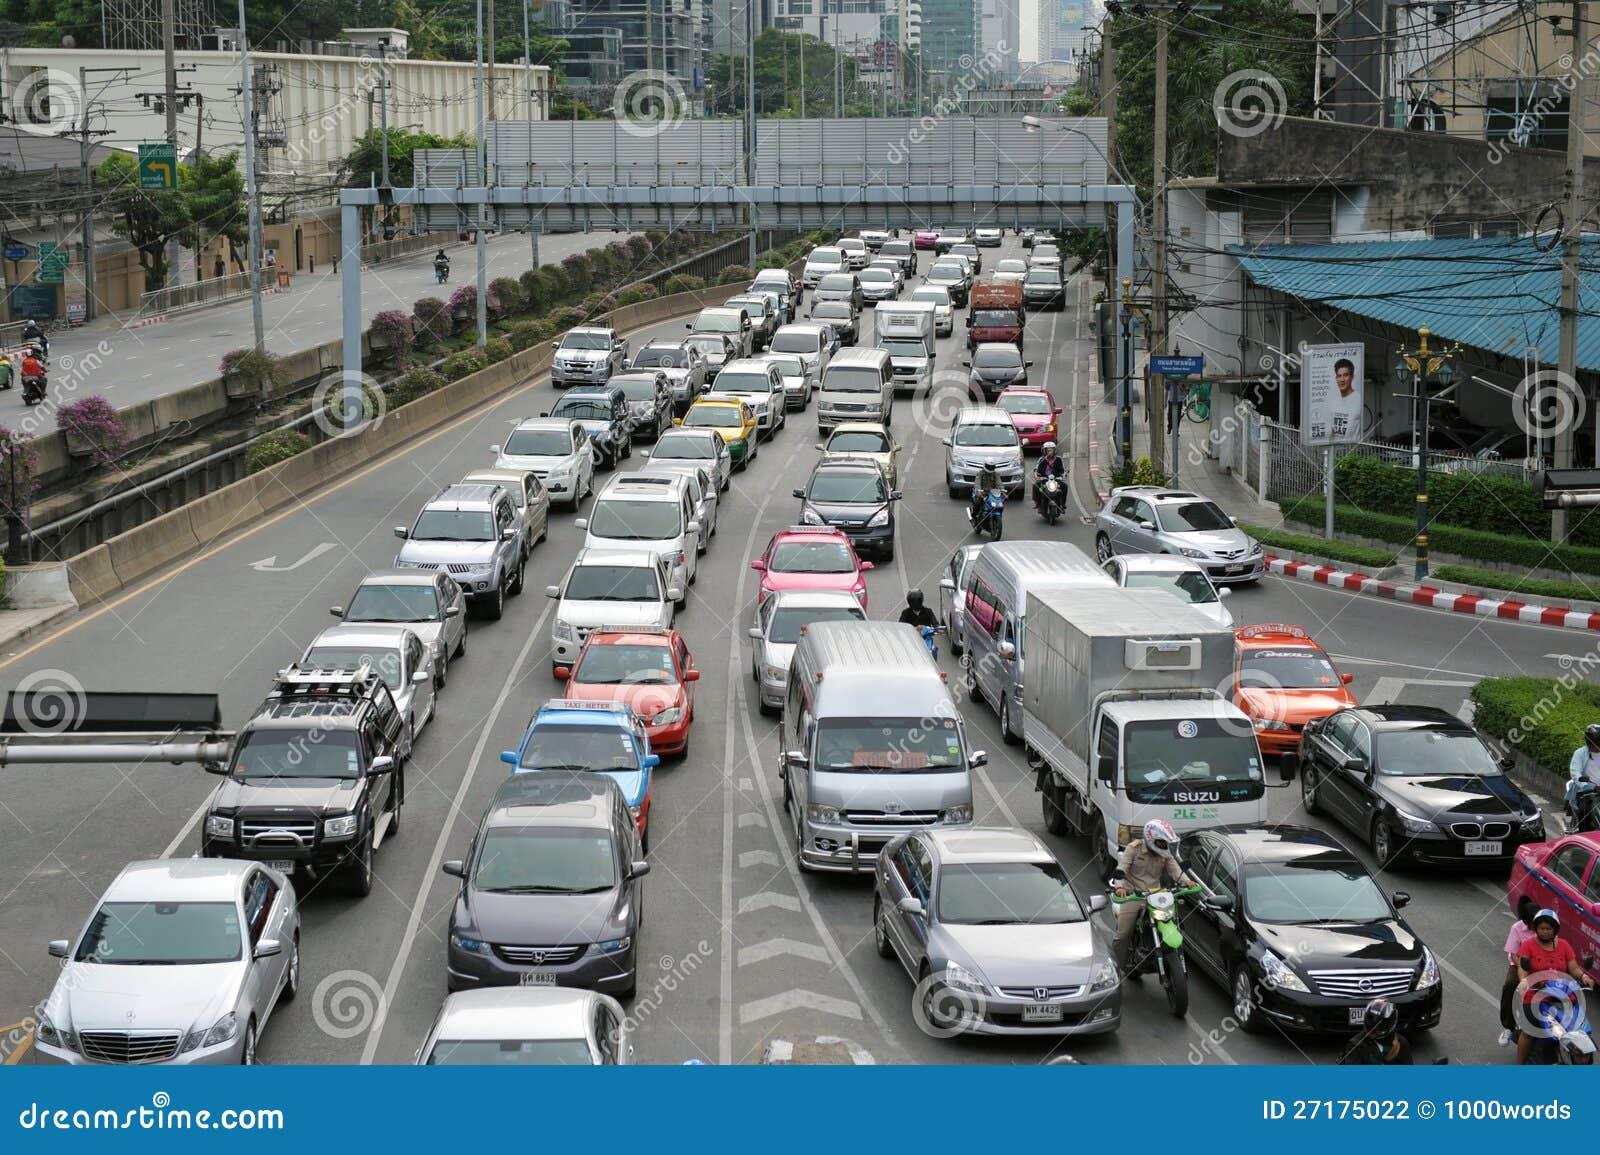 body traffic jam